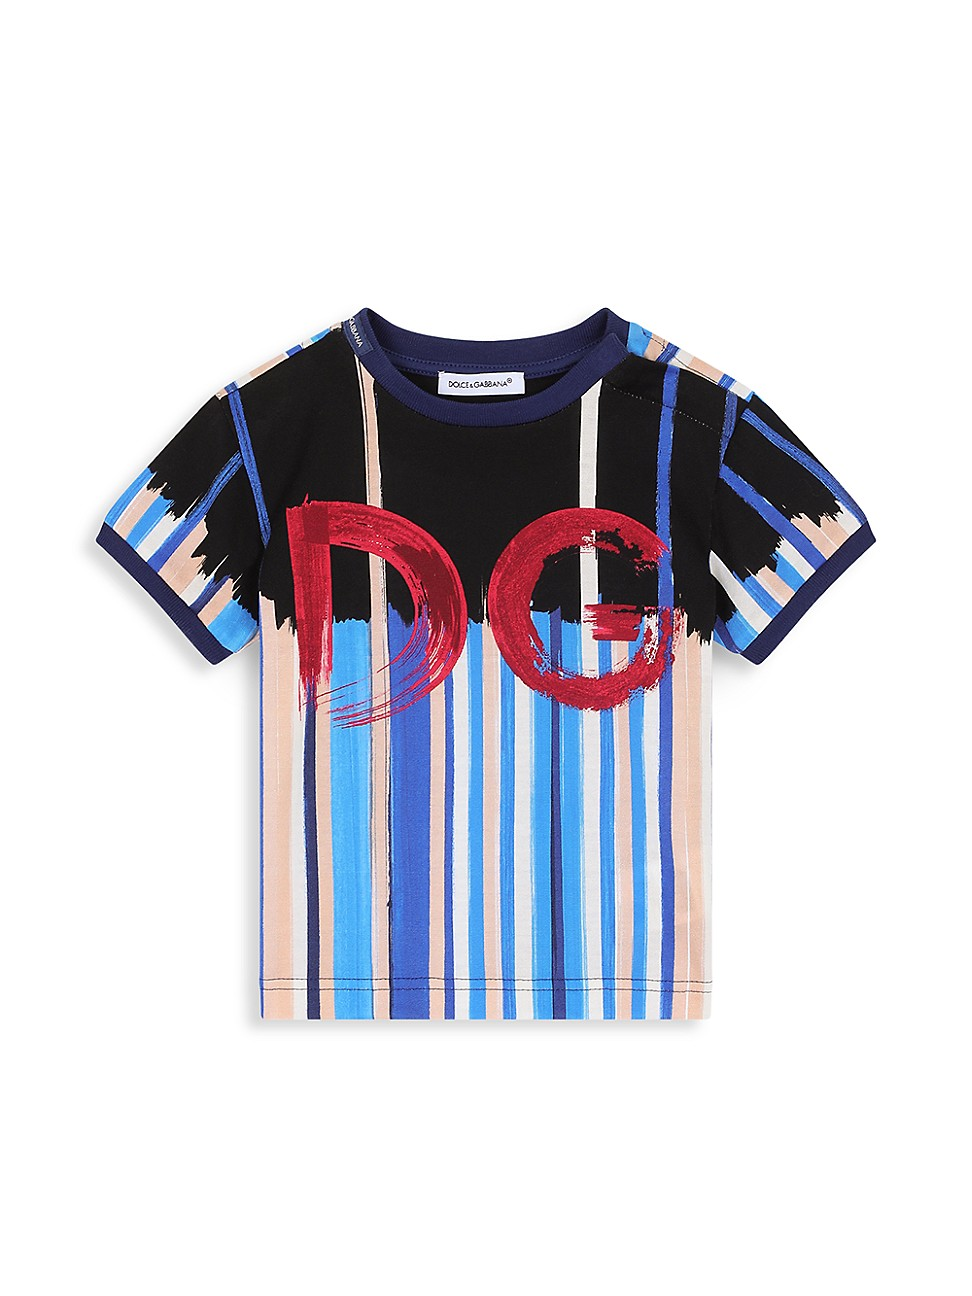 Dolce & Gabbana Cottons BABY BOY'S BRUSHSTROKE DG T-SHIRT